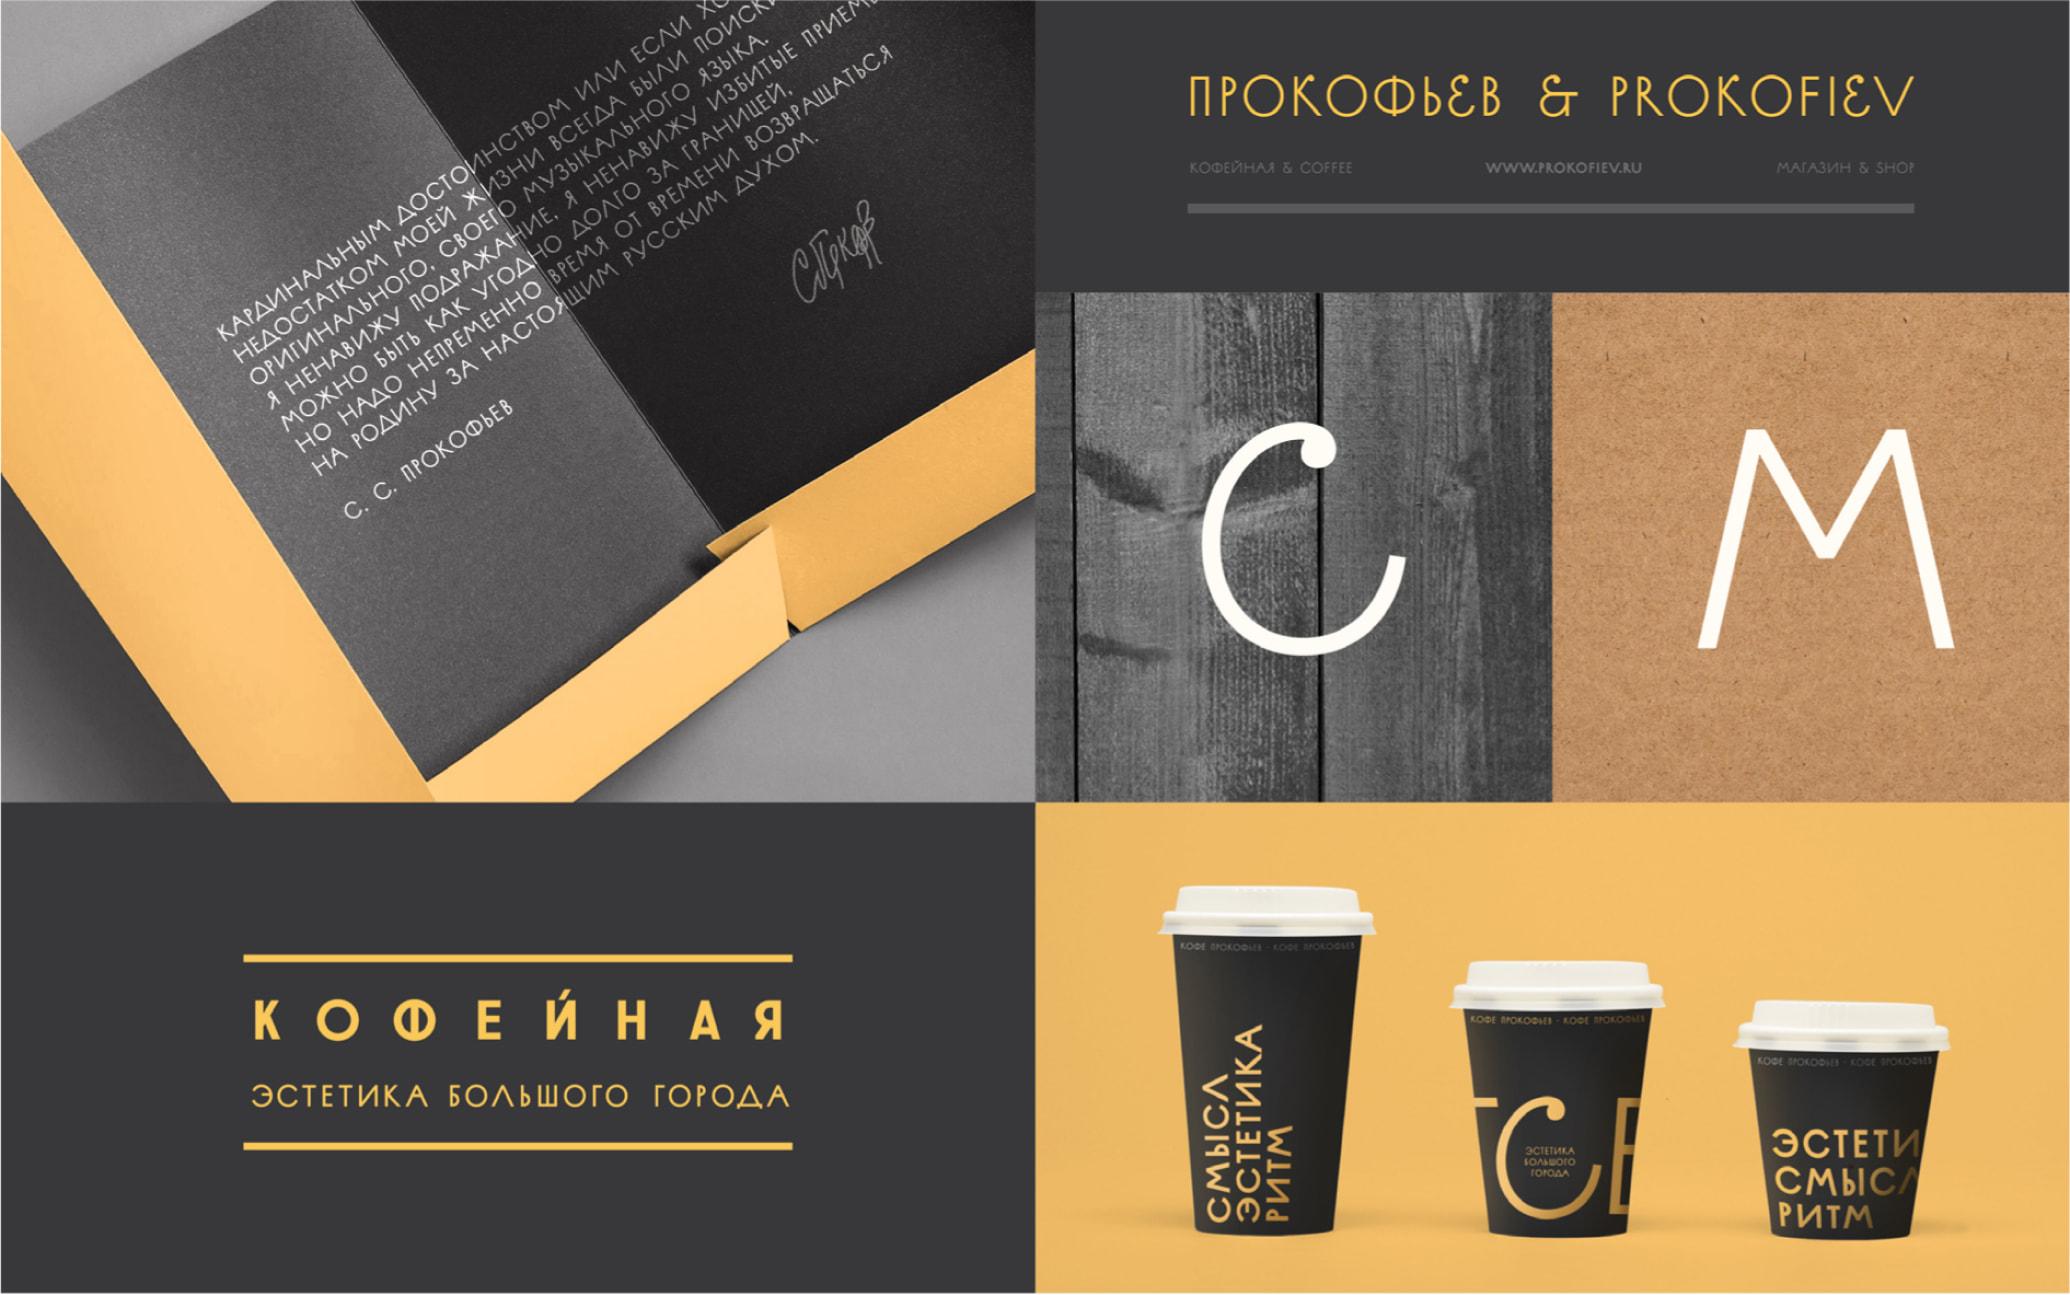 prokofiev_09-3